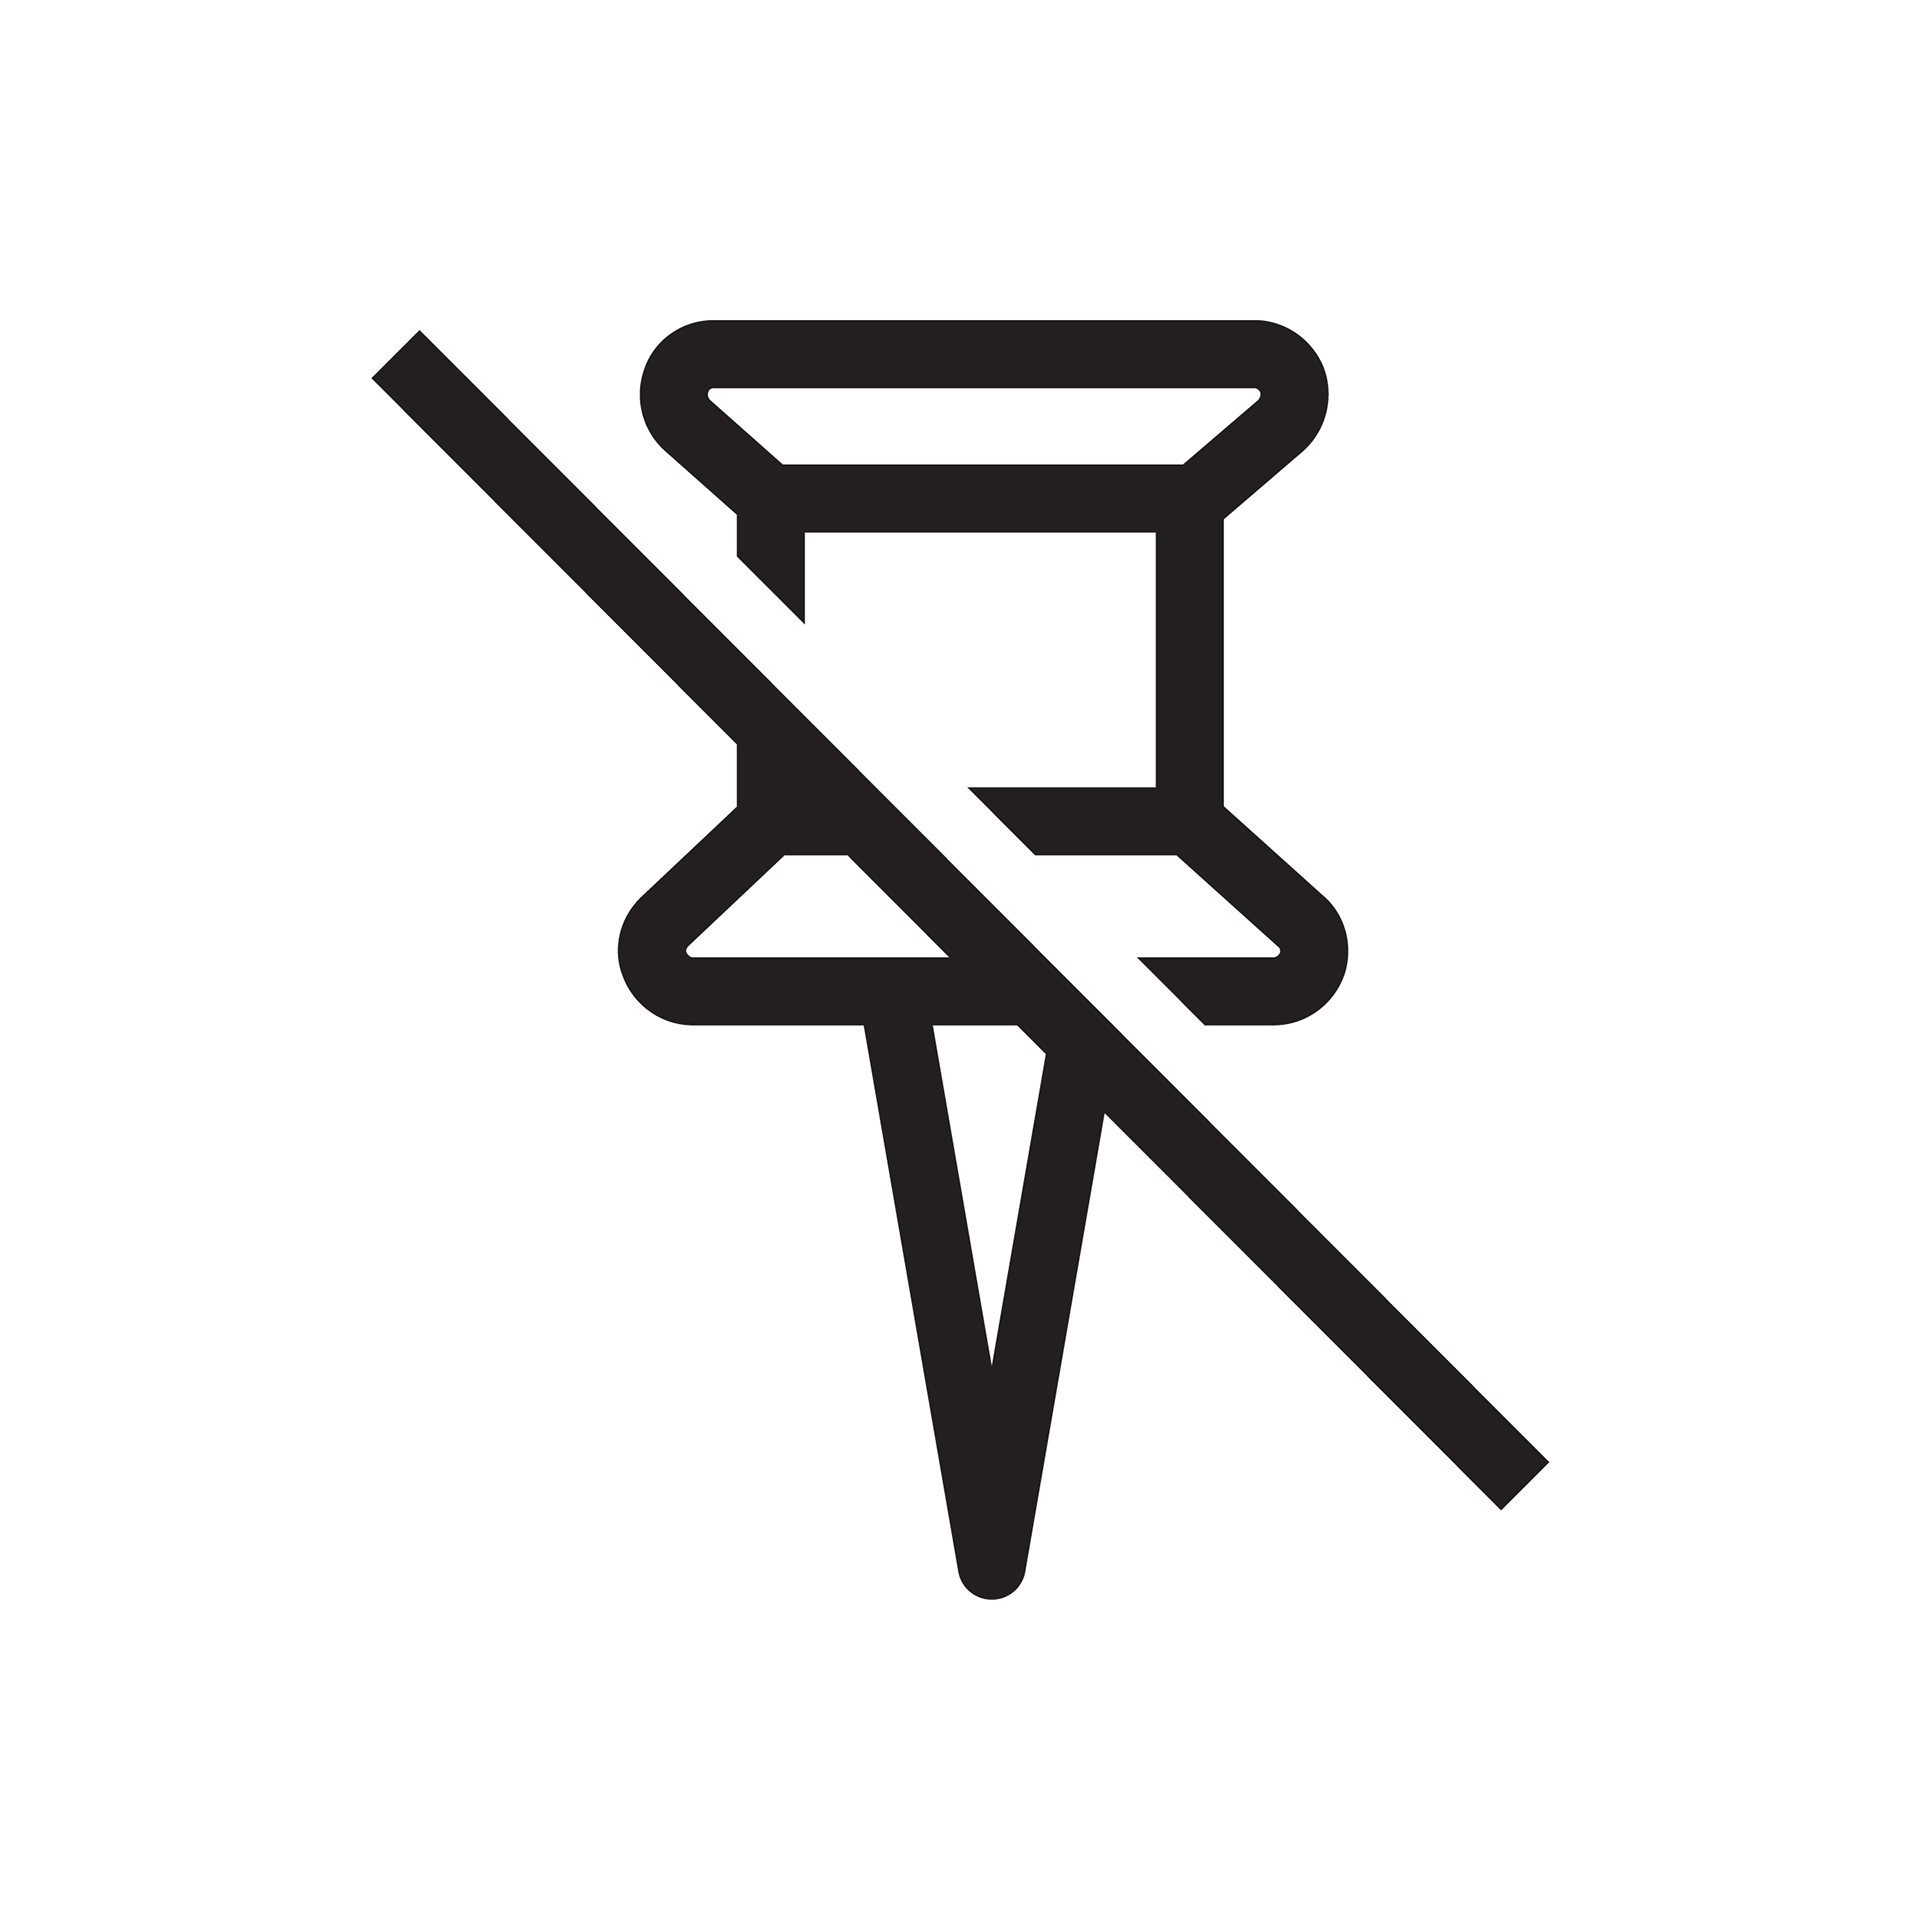 Bosch_Icon_Starter-Kit_Repro_Web_04